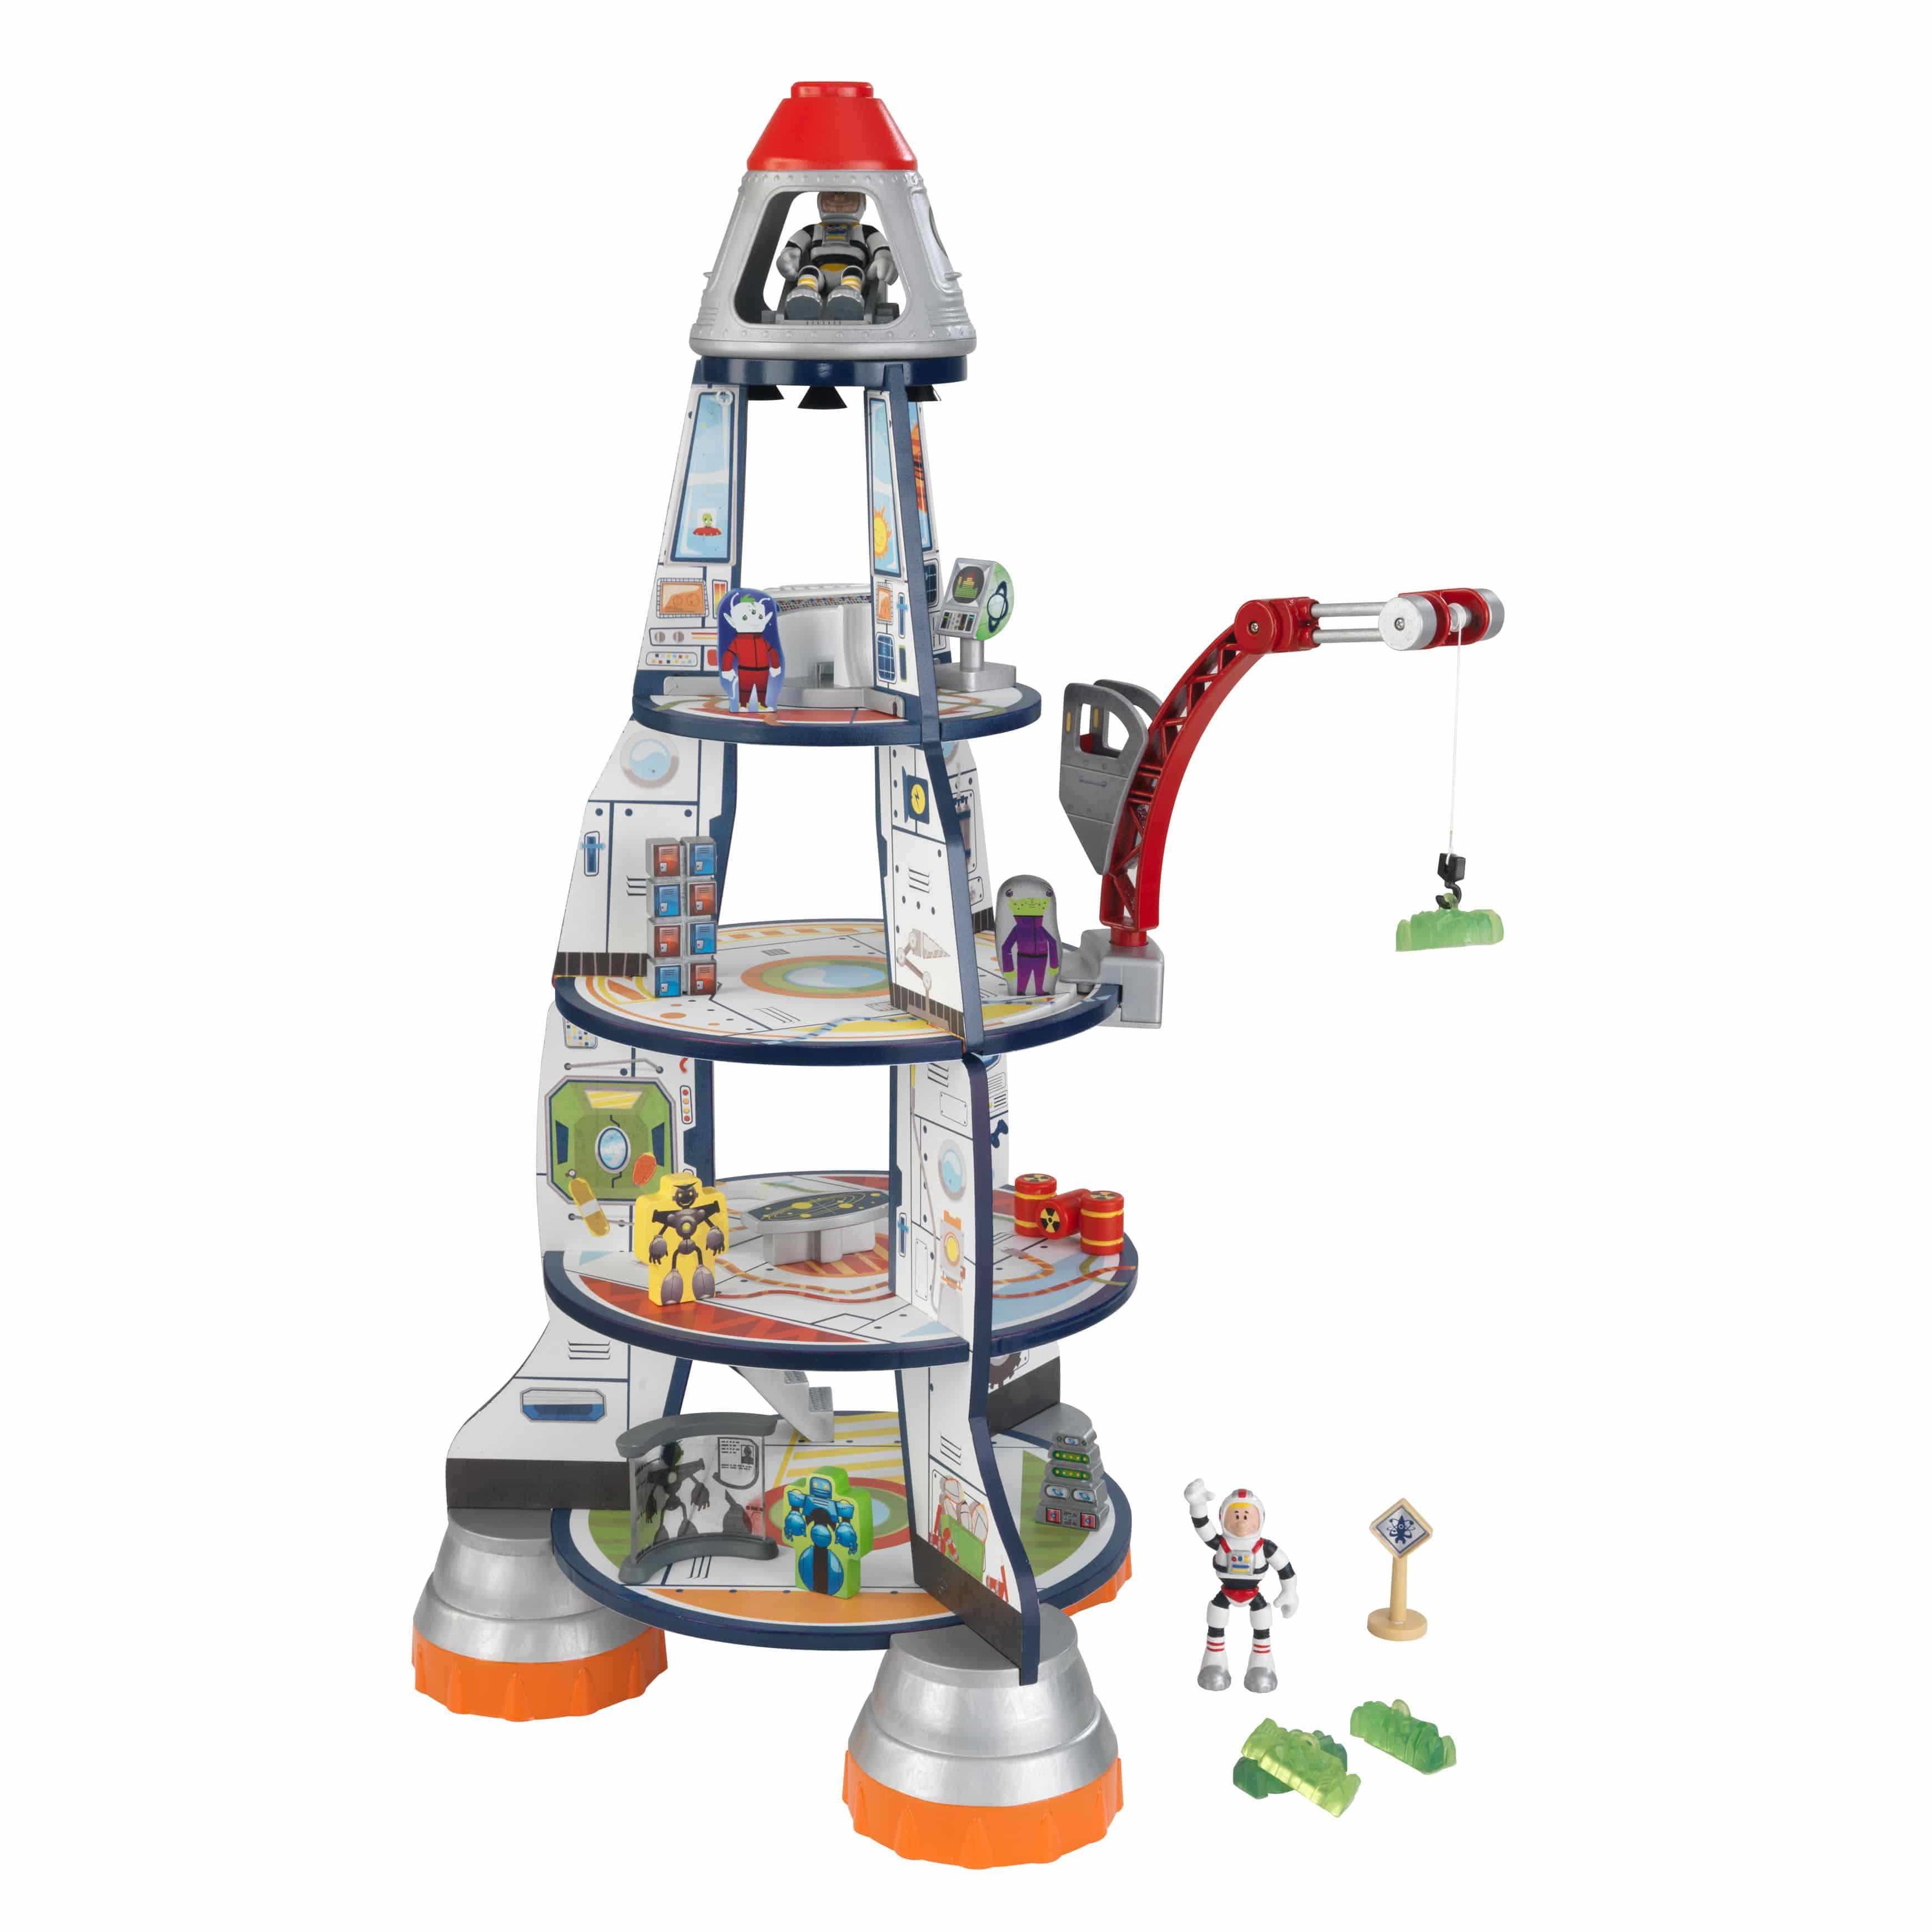 KidKraft - дървена играчка за момчета - Космическа ракета(5)-bellamie